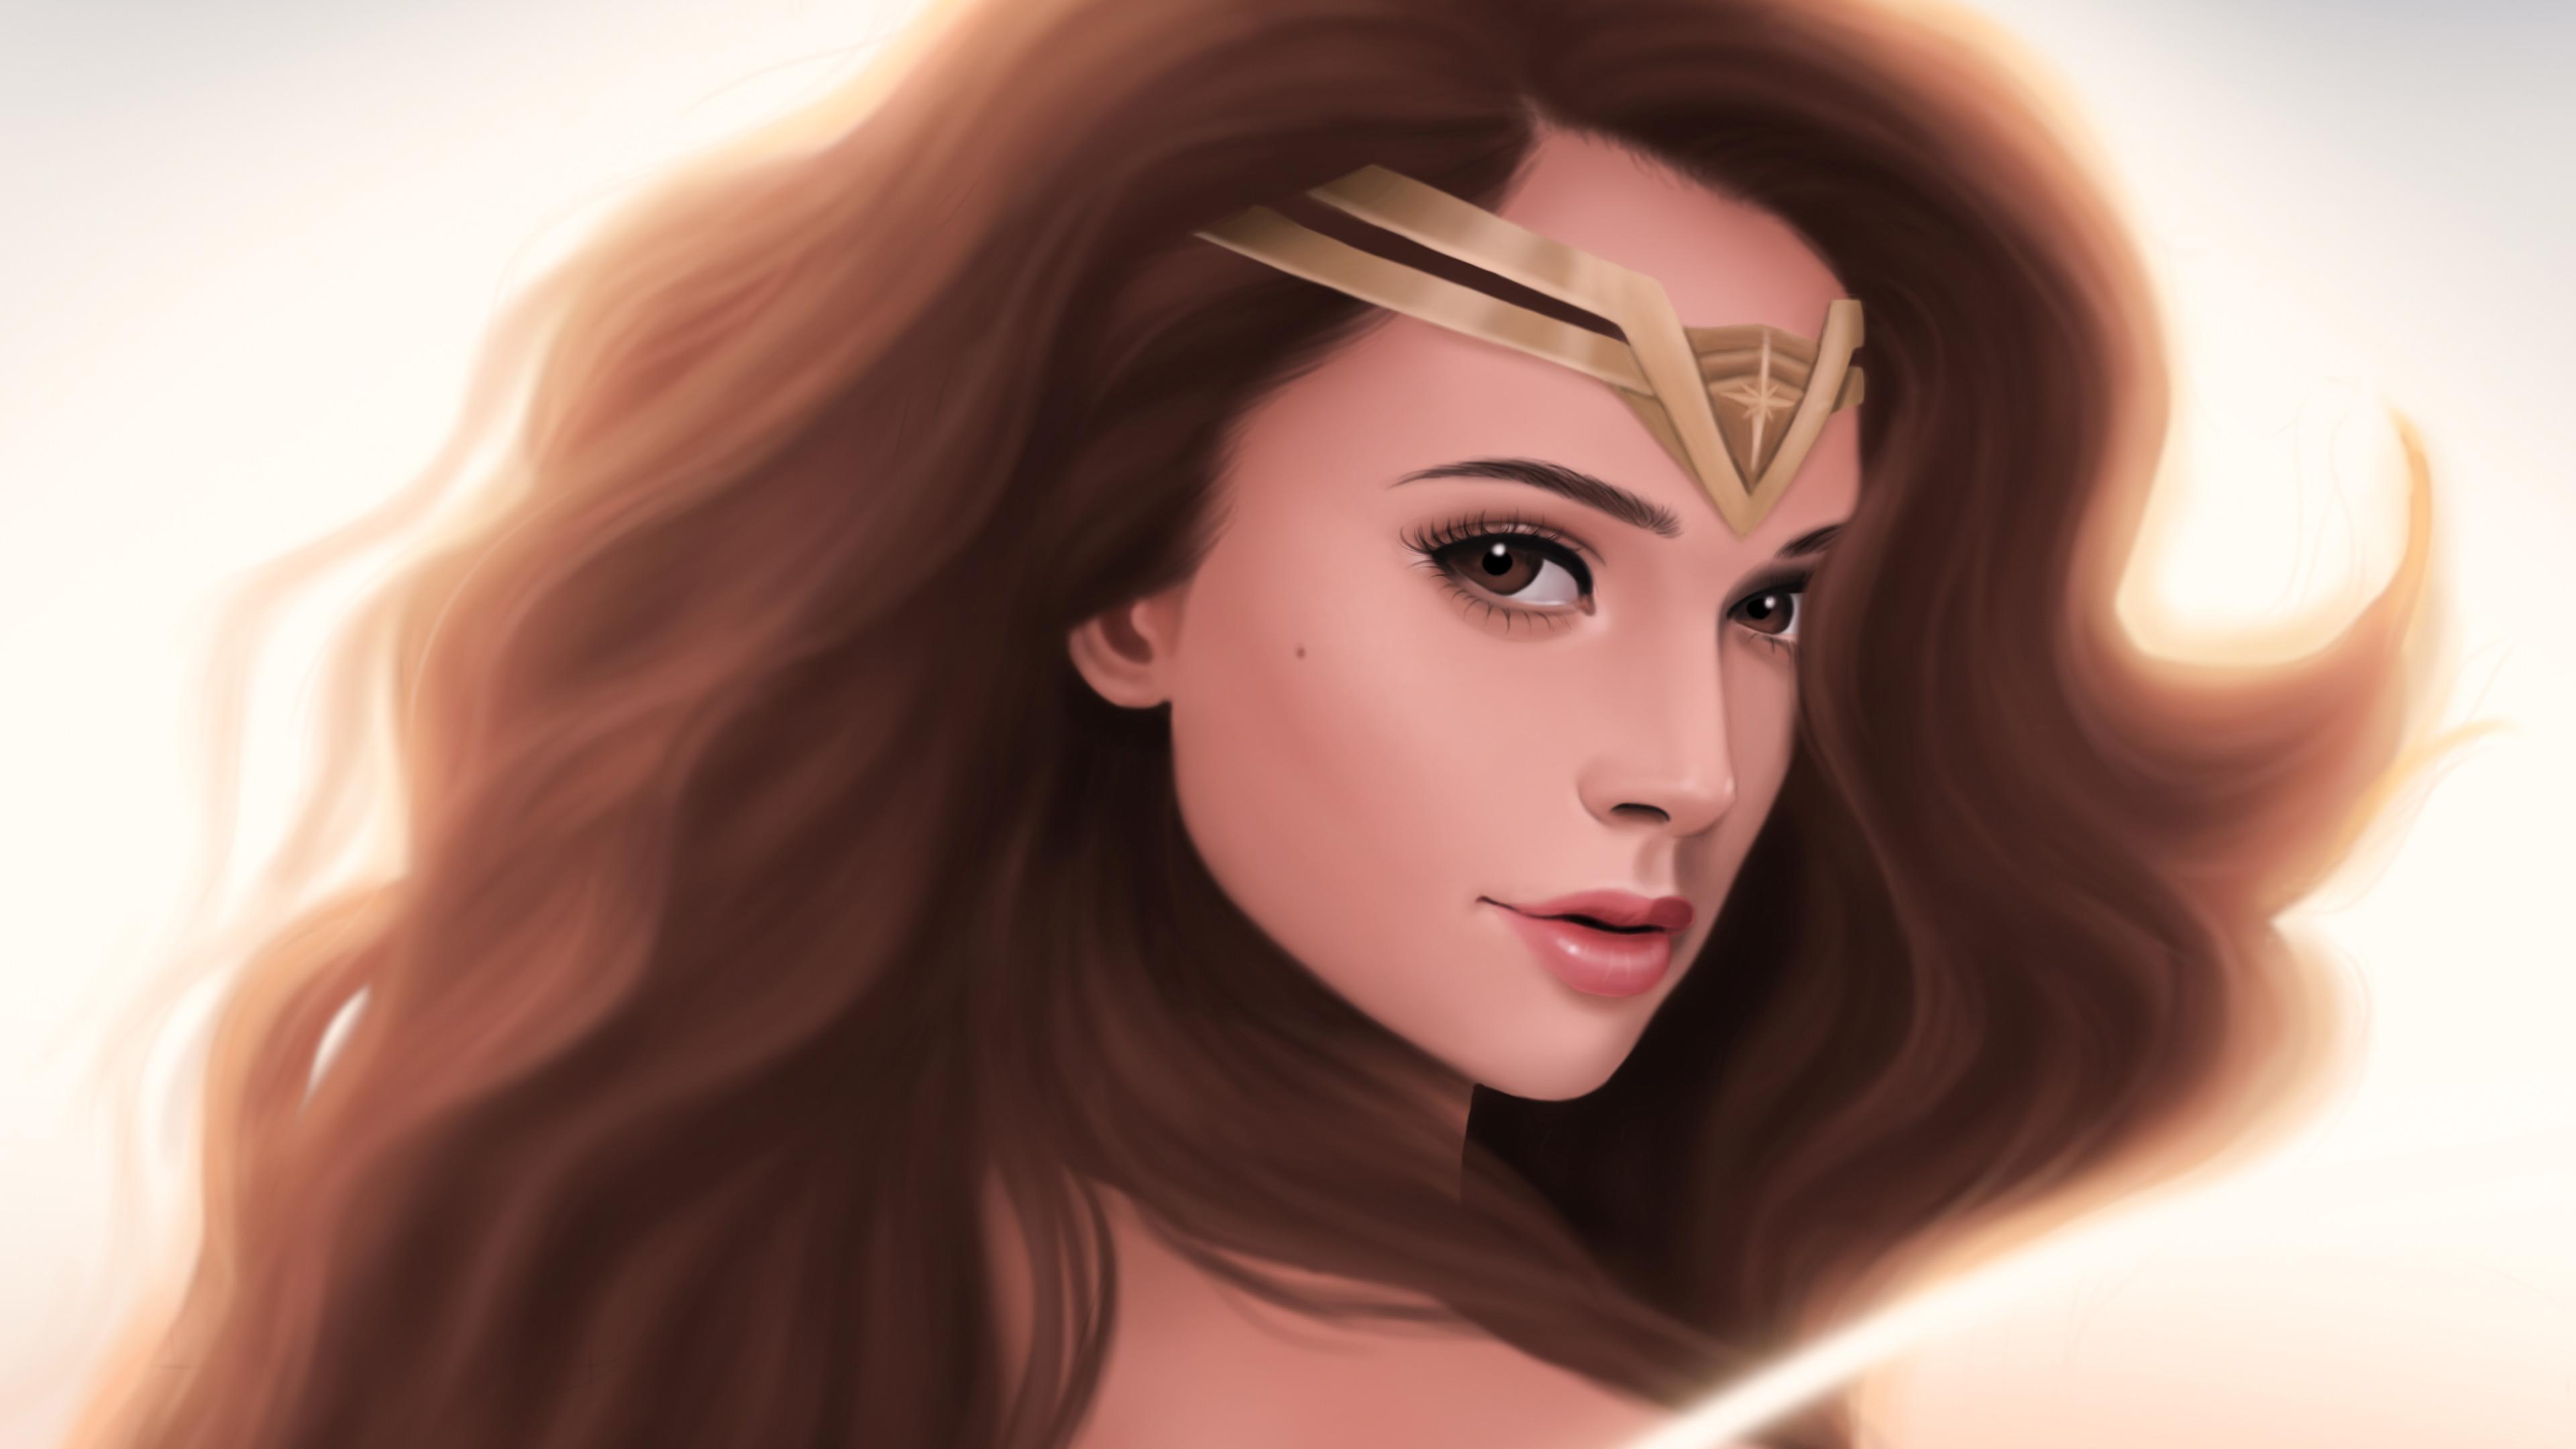 Wonder Woman Gorgeous Art, HD Superheroes, 4k Wallpapers